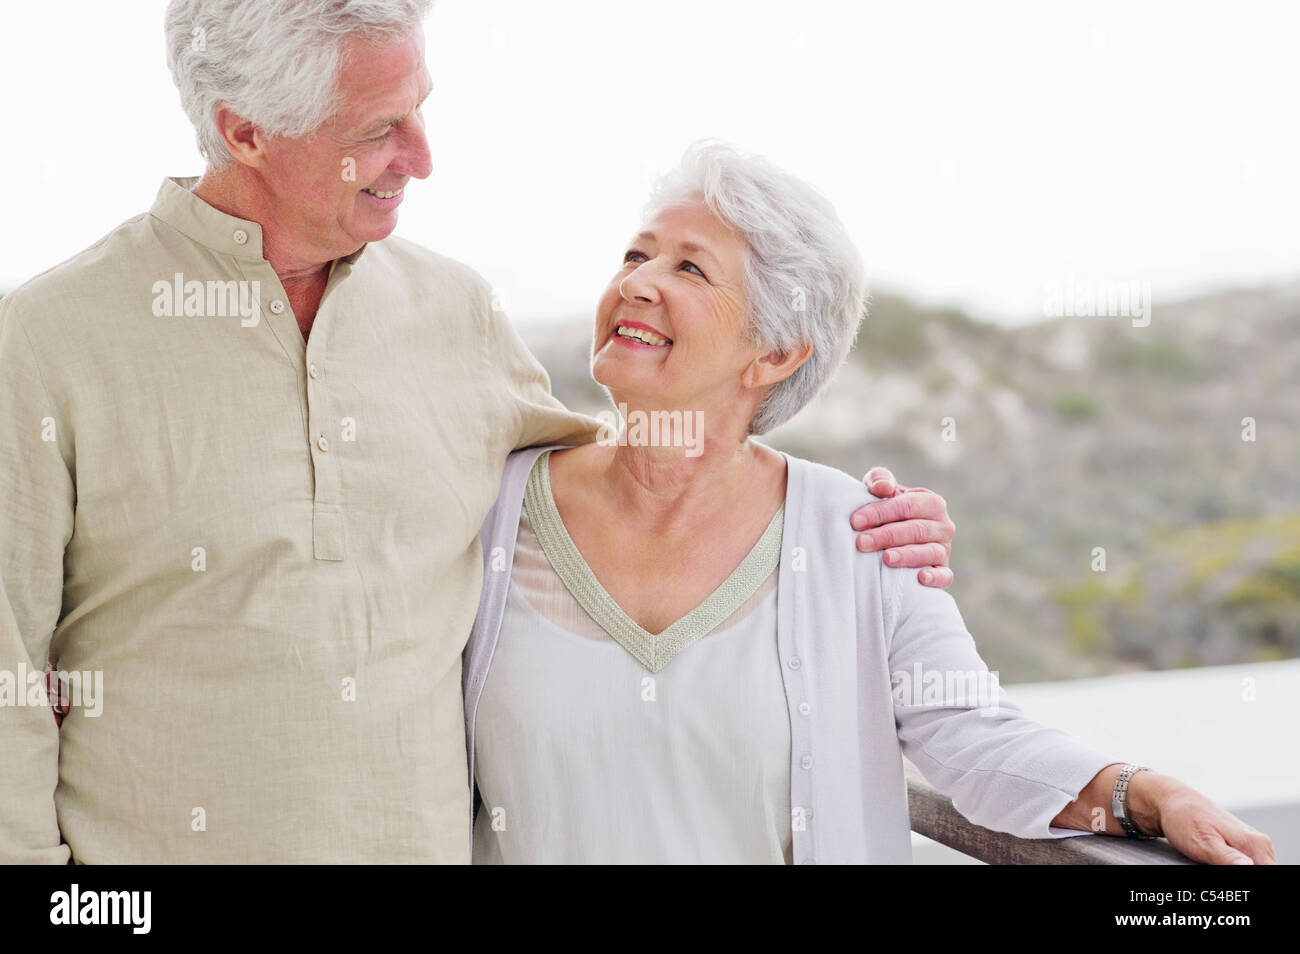 Senior man standing with his arm around a senior woman - Stock Image